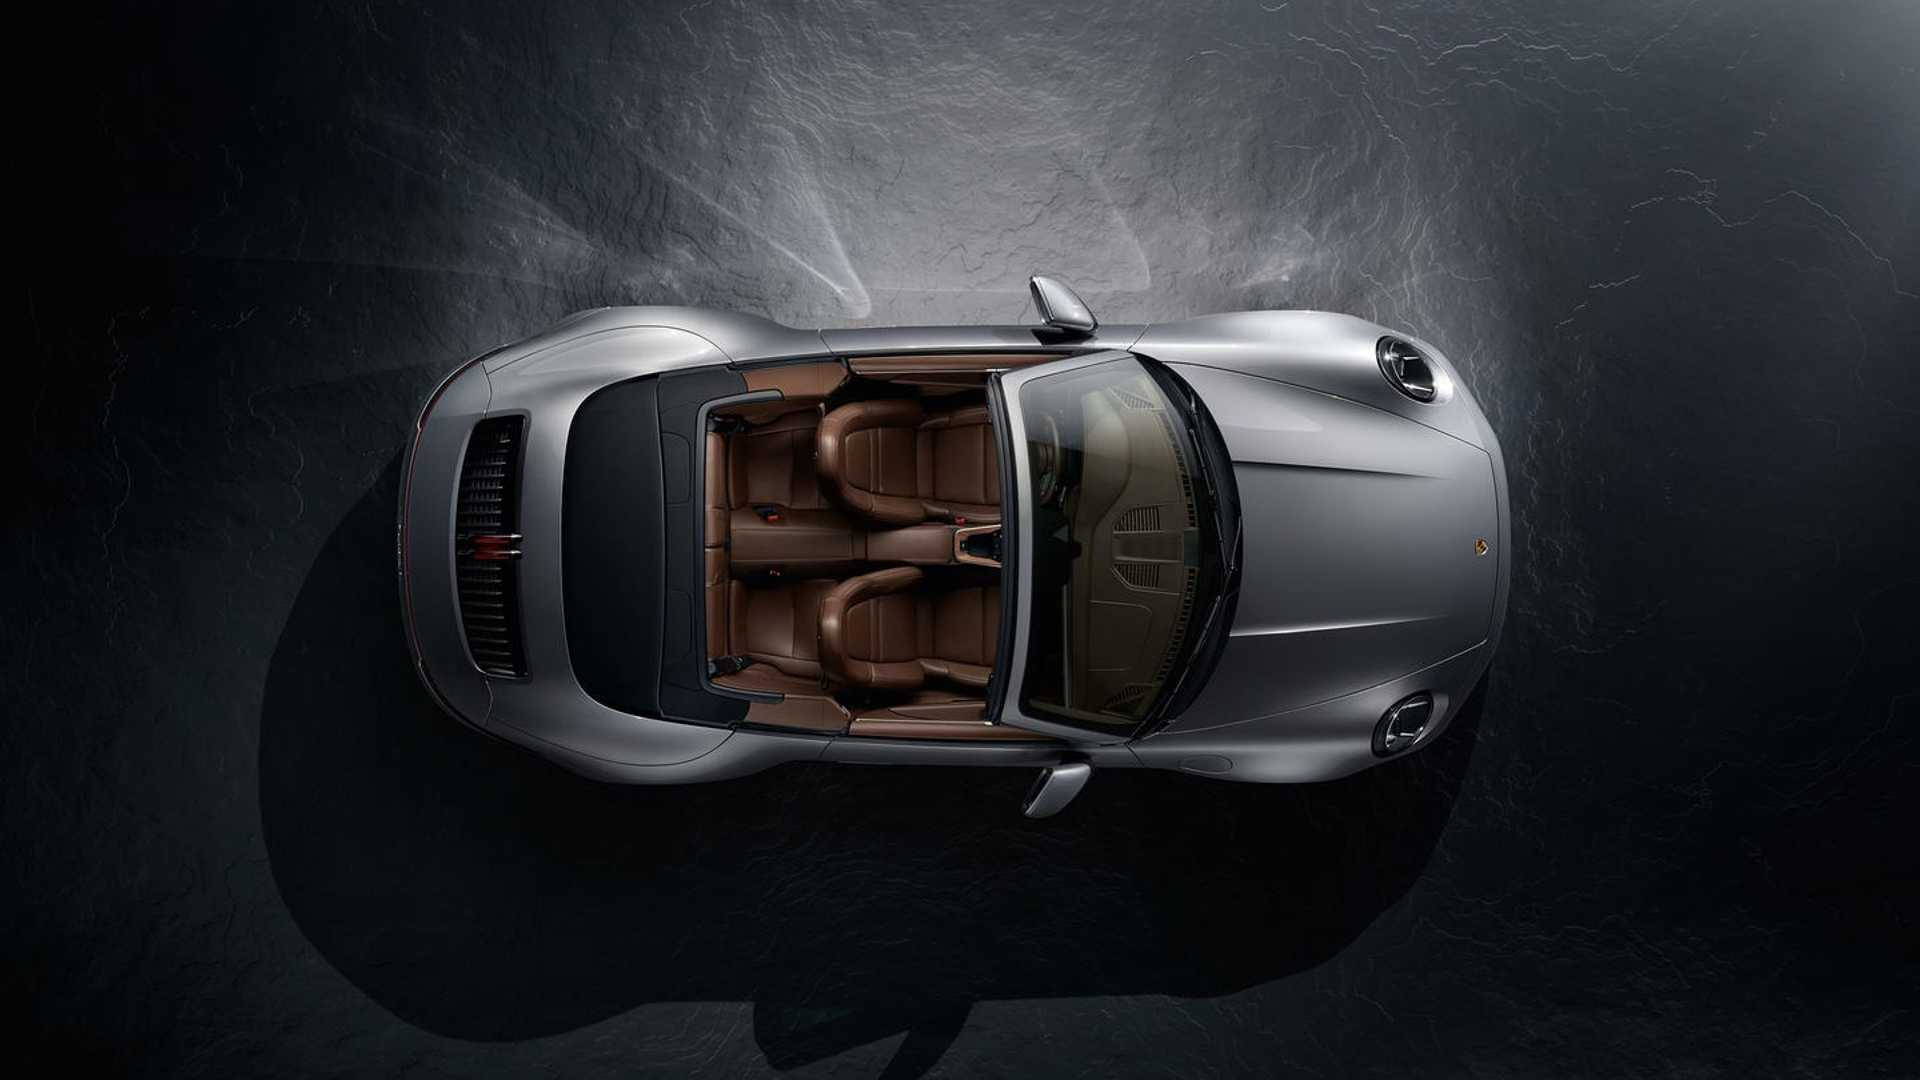 porsche-911-992-cabriolet (2)